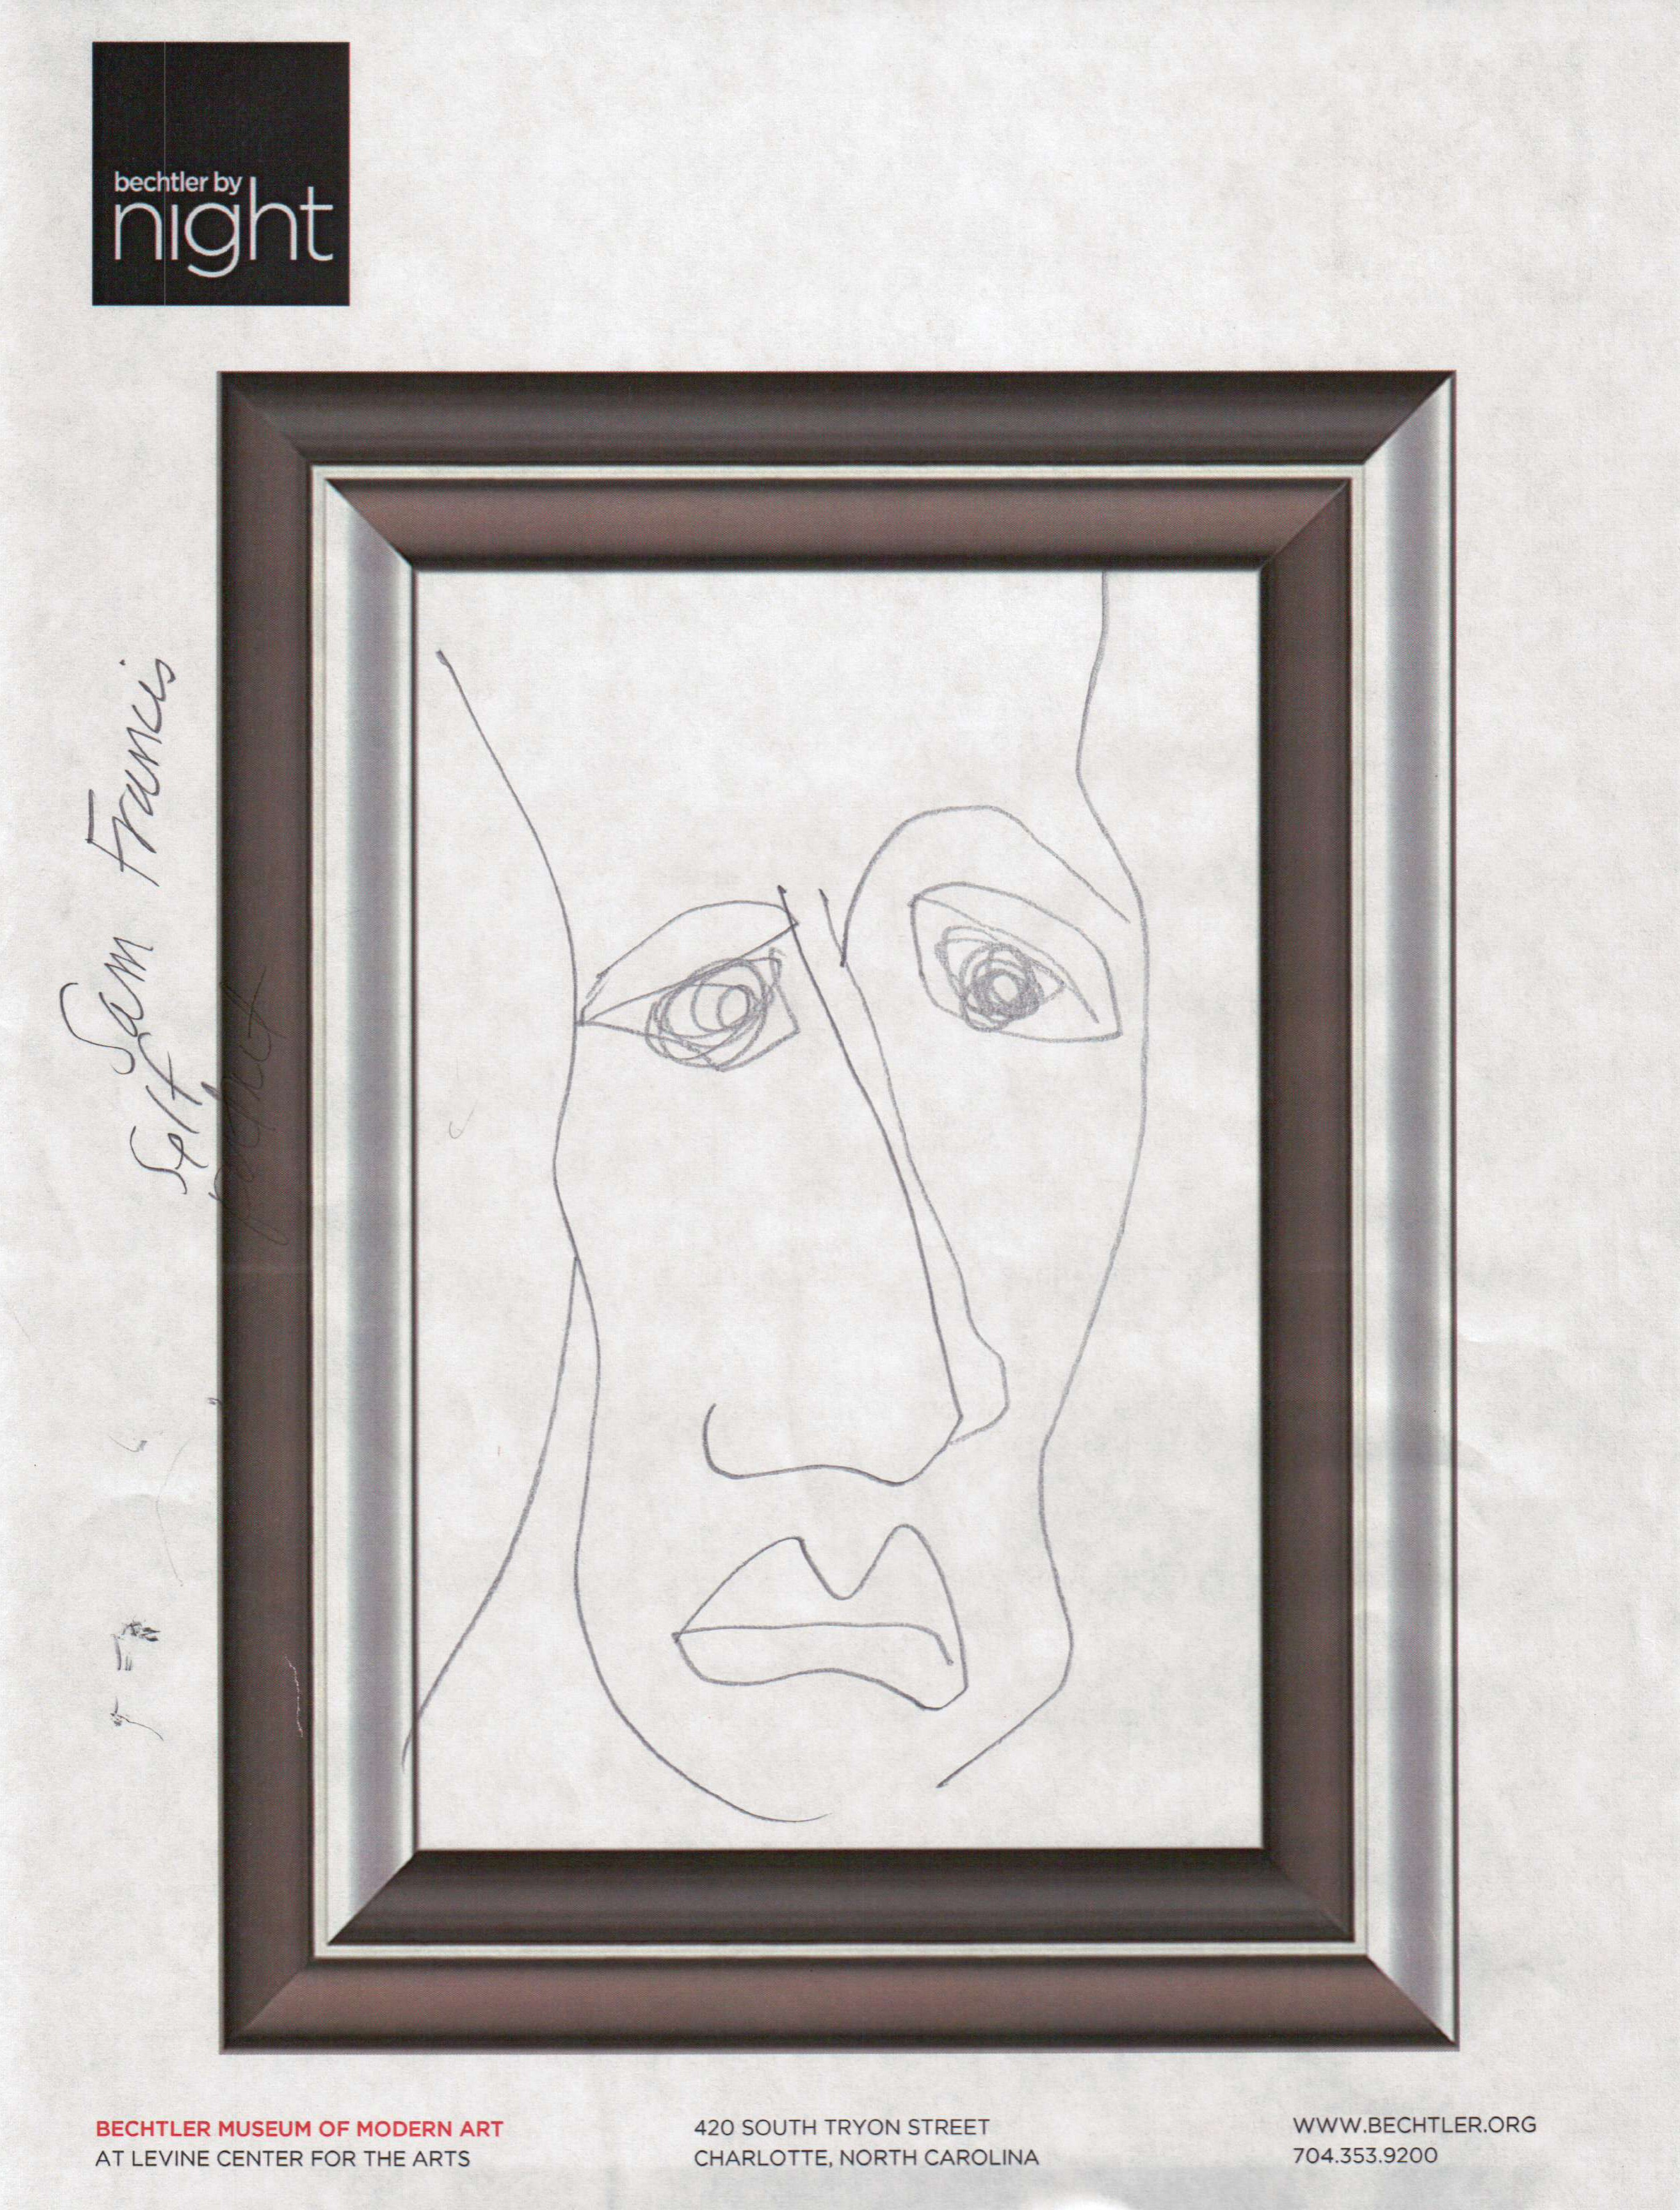 Jeannie M. Bushnell Draws her version of a sam francis self portrait